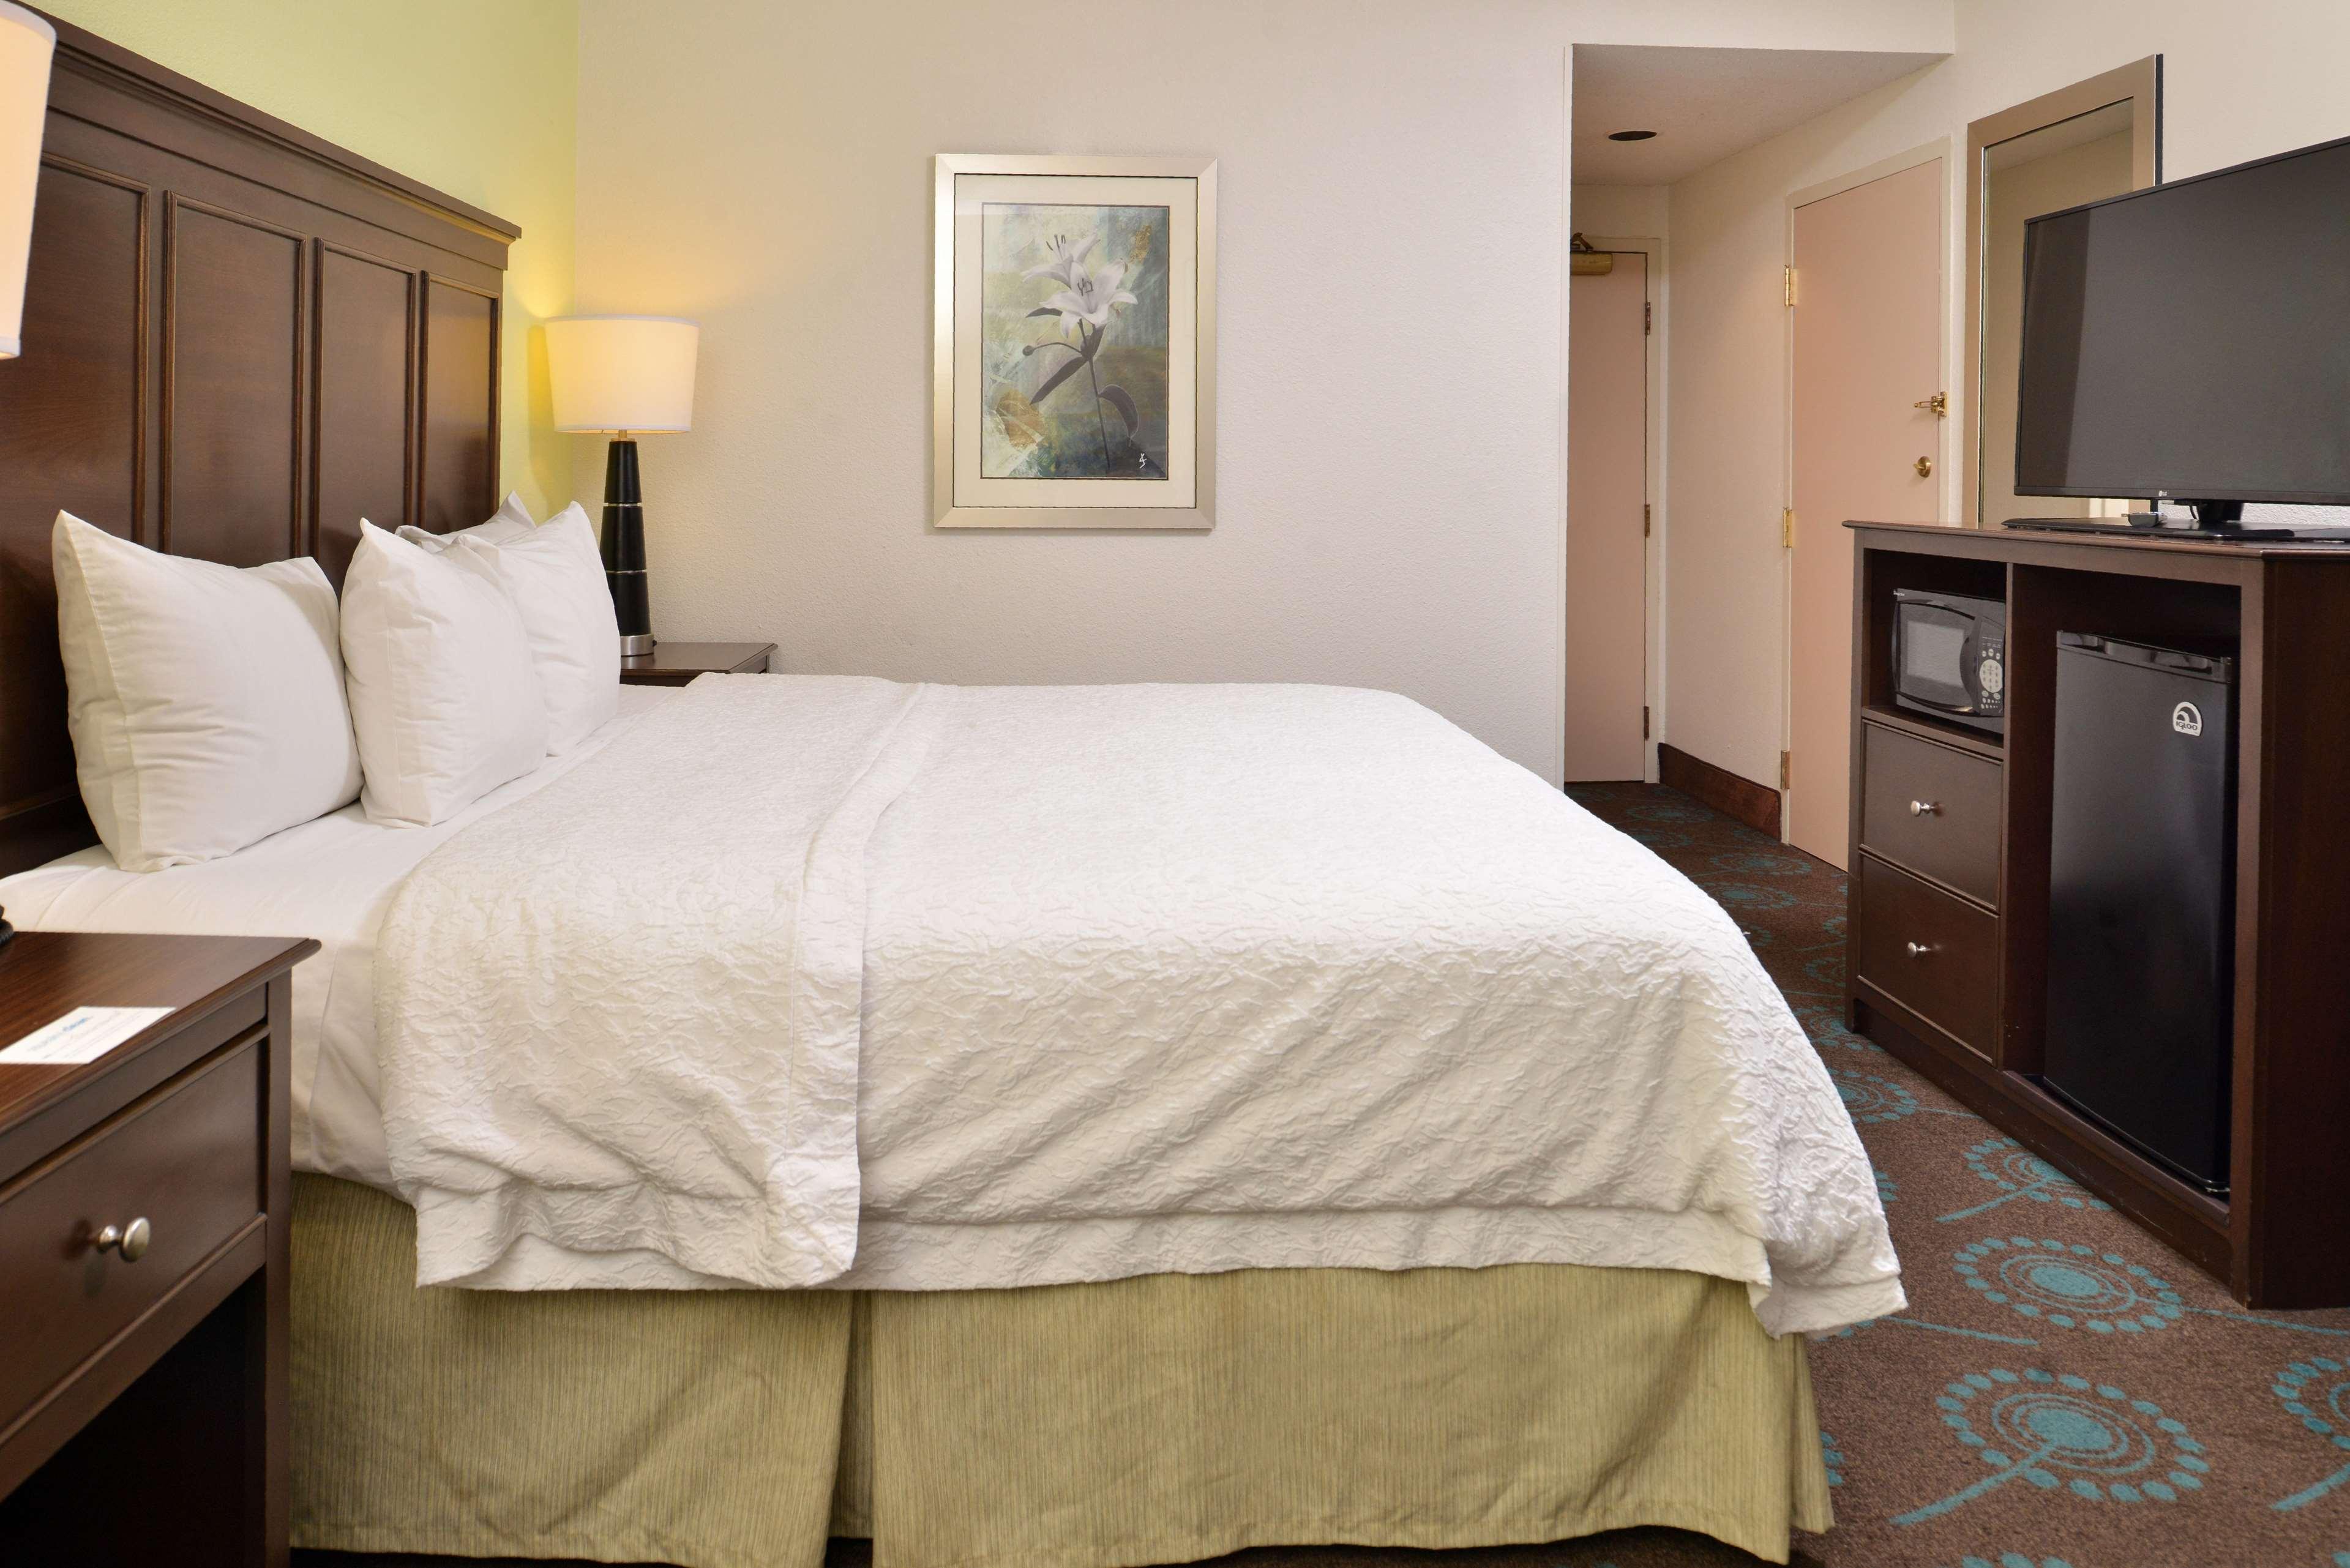 Hampton Inn & Suites Newport News (Oyster Point) image 45